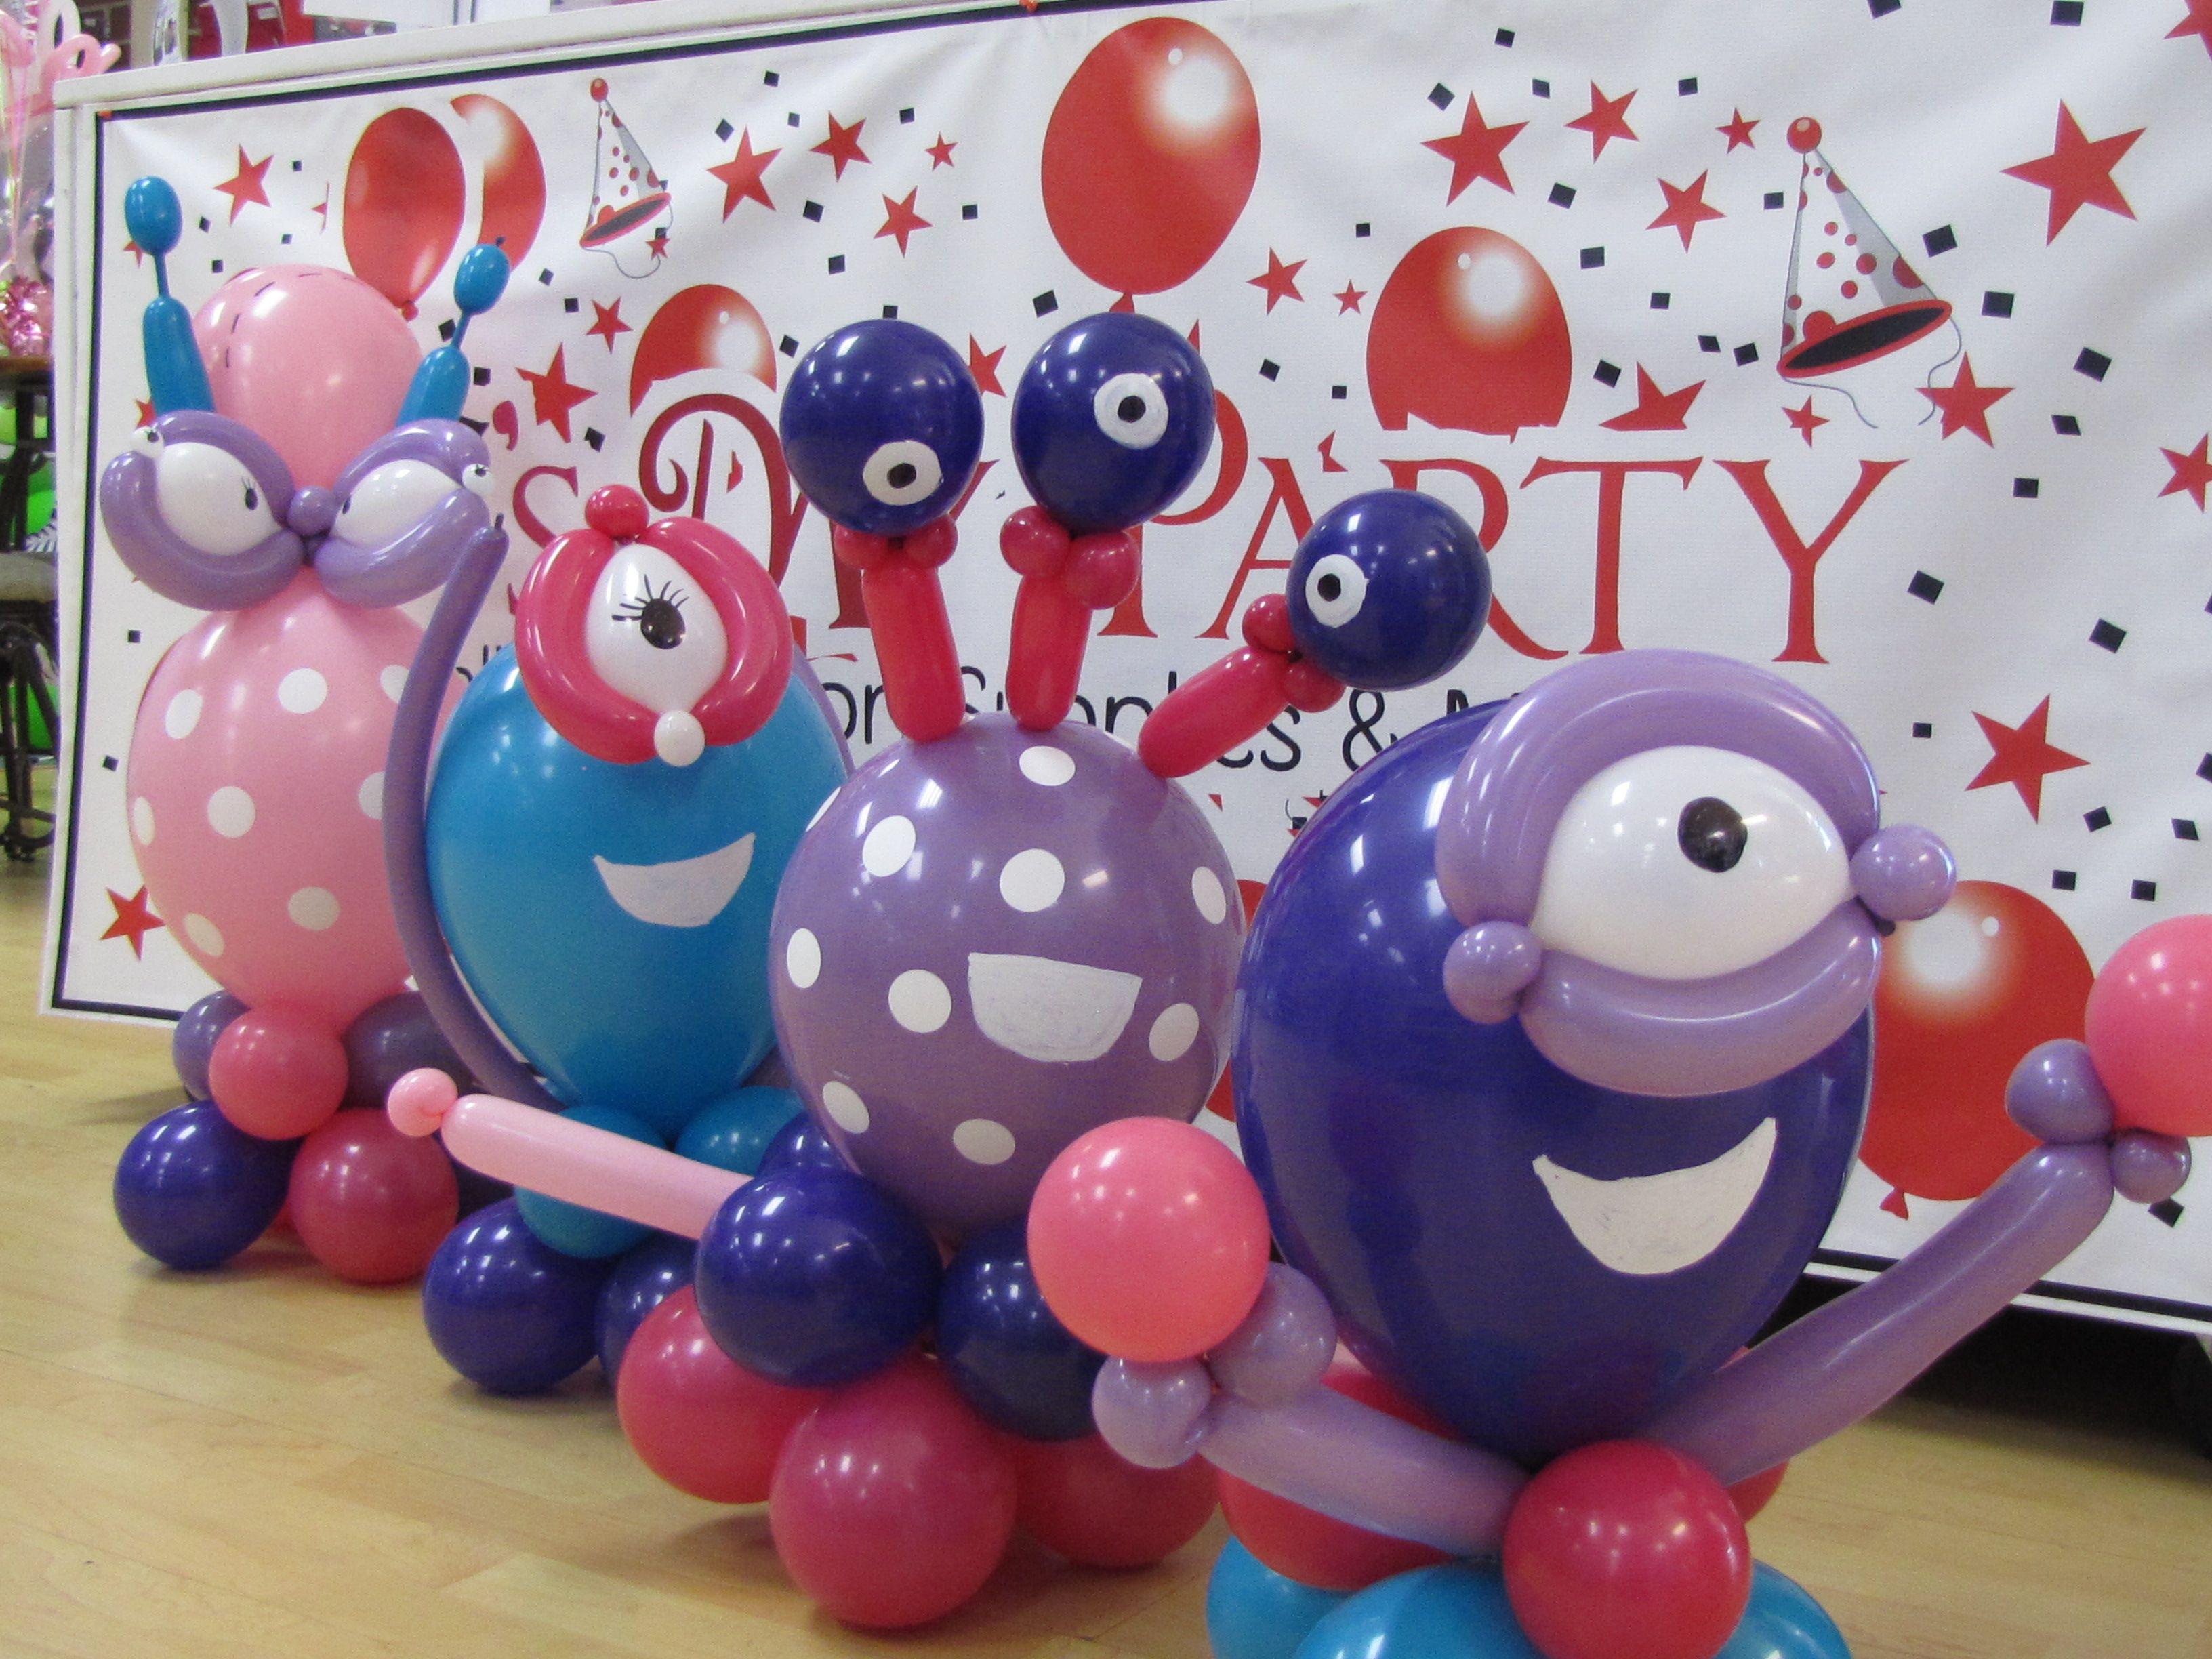 https://www.google.com/search?q=Monsters balloon